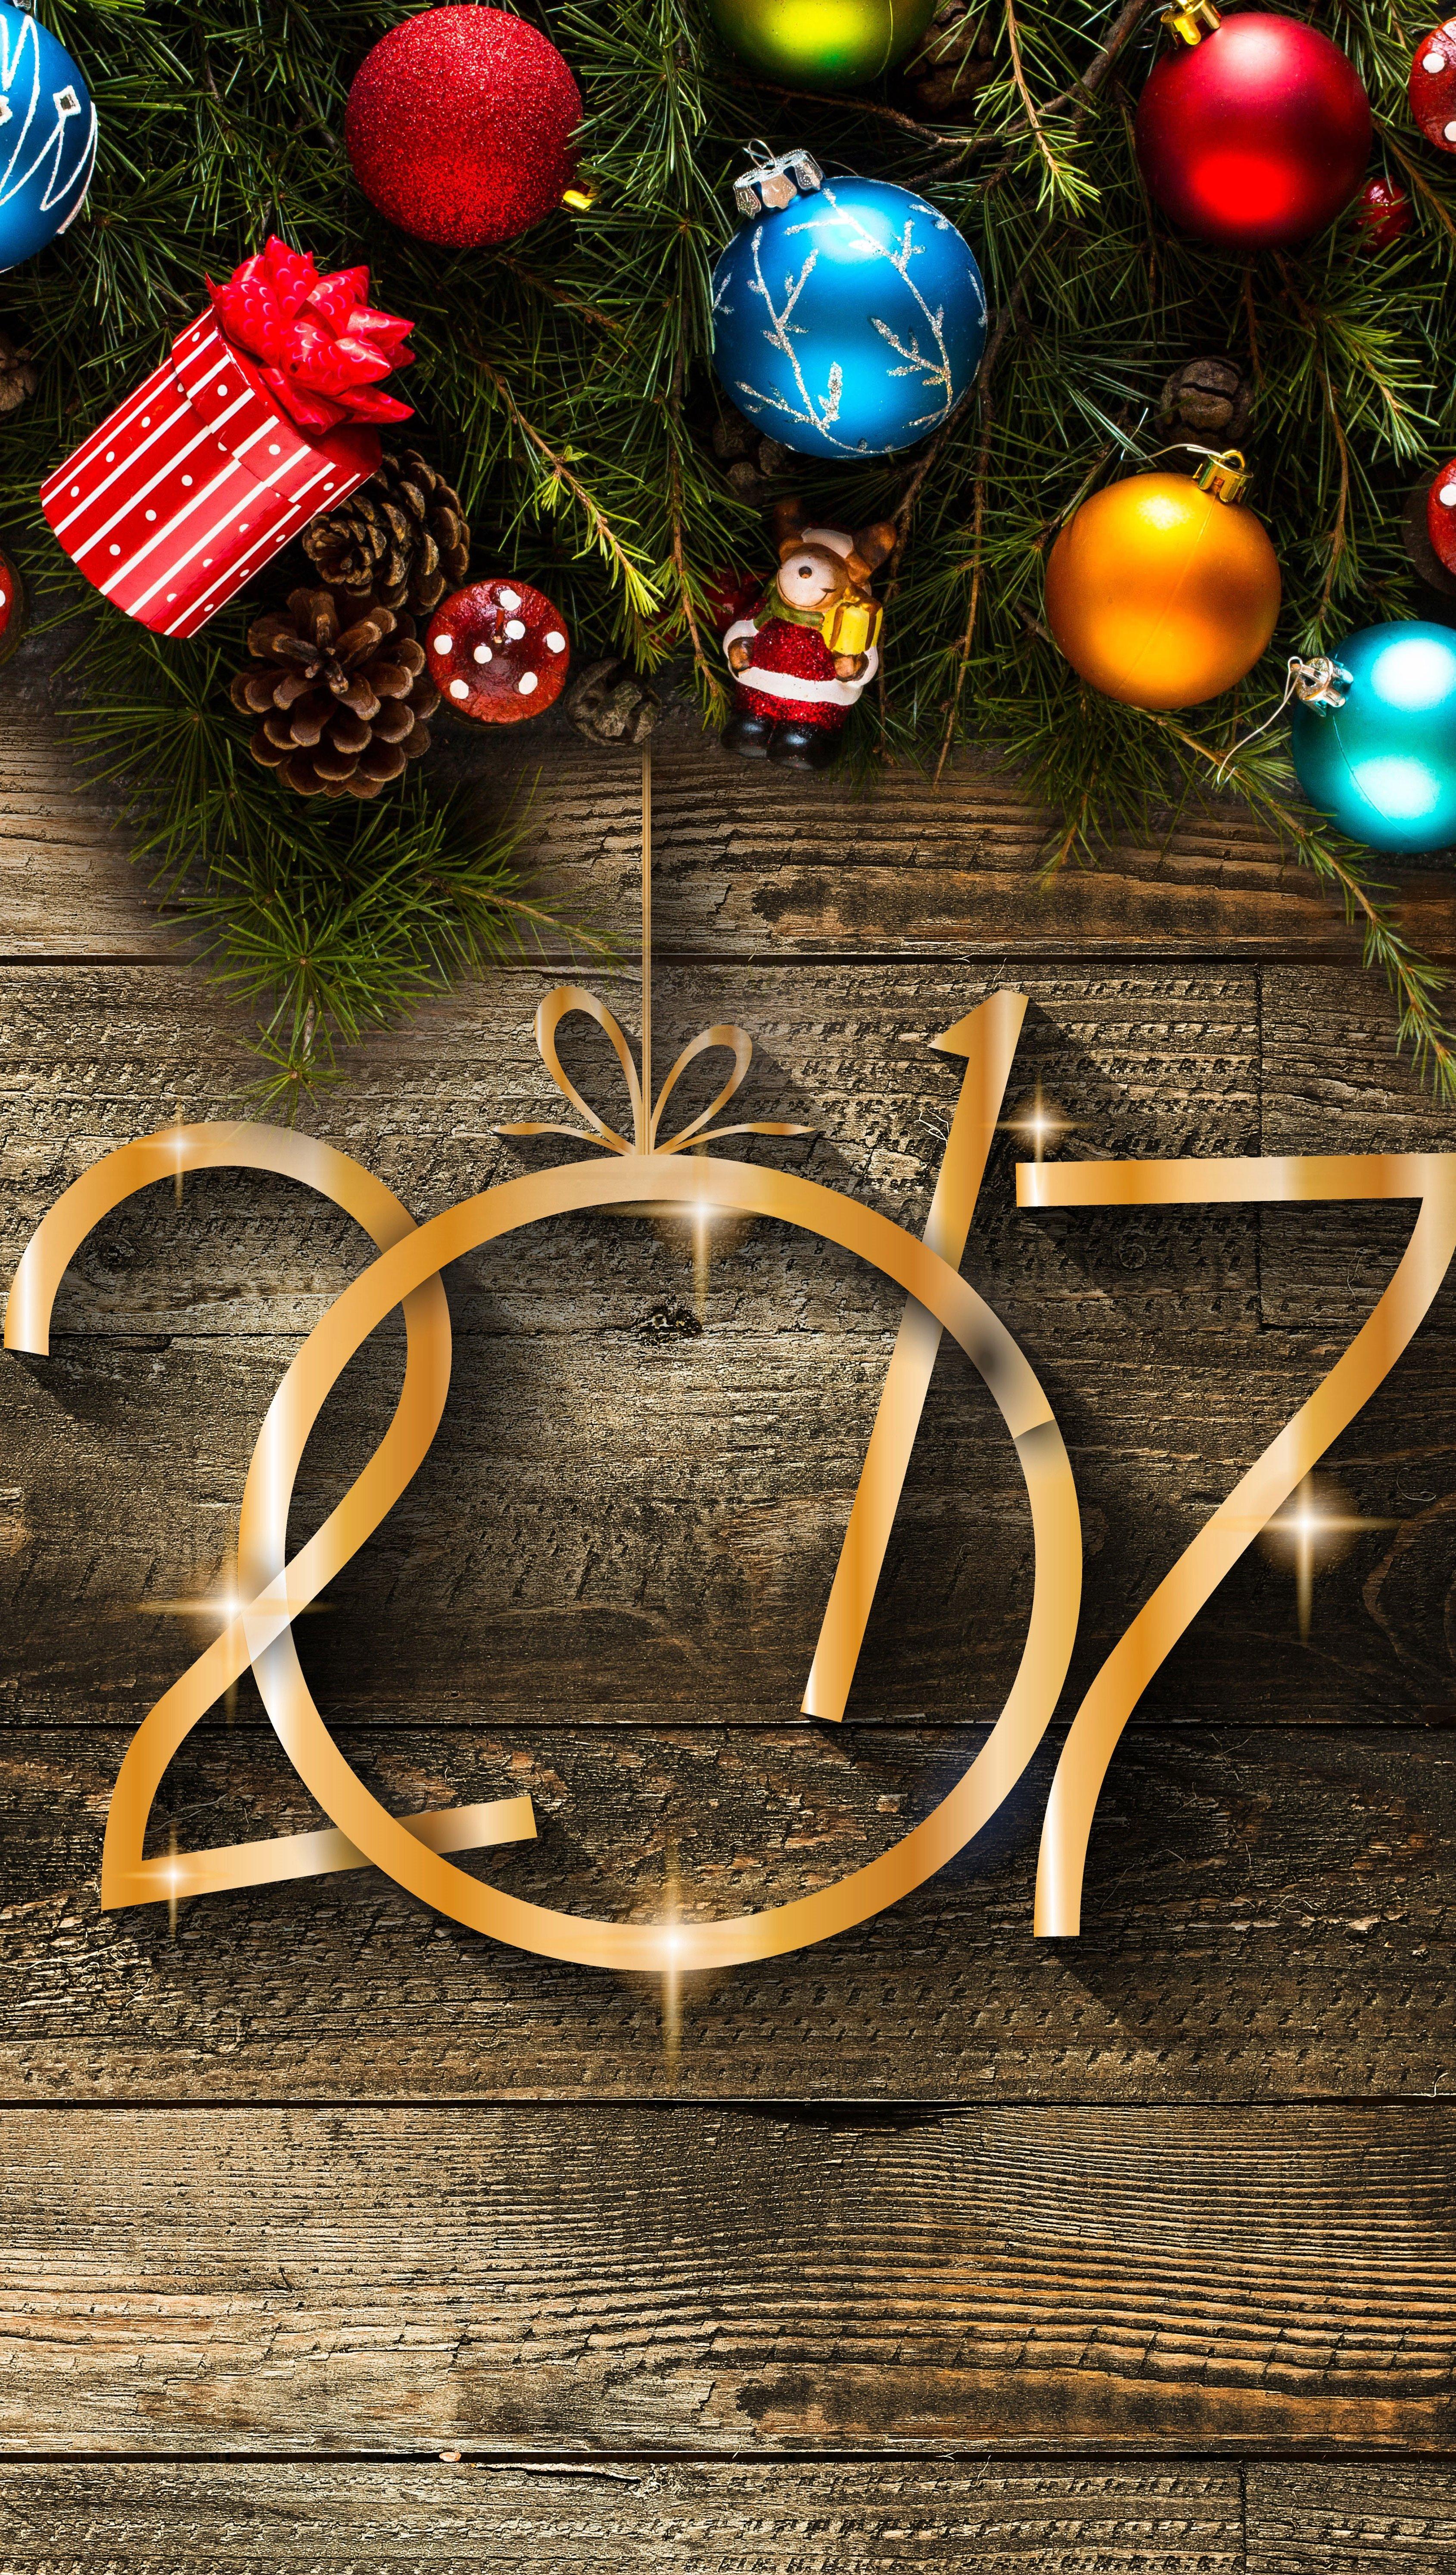 Fondos de pantalla Feliz año 2017 con adornos navideños Vertical